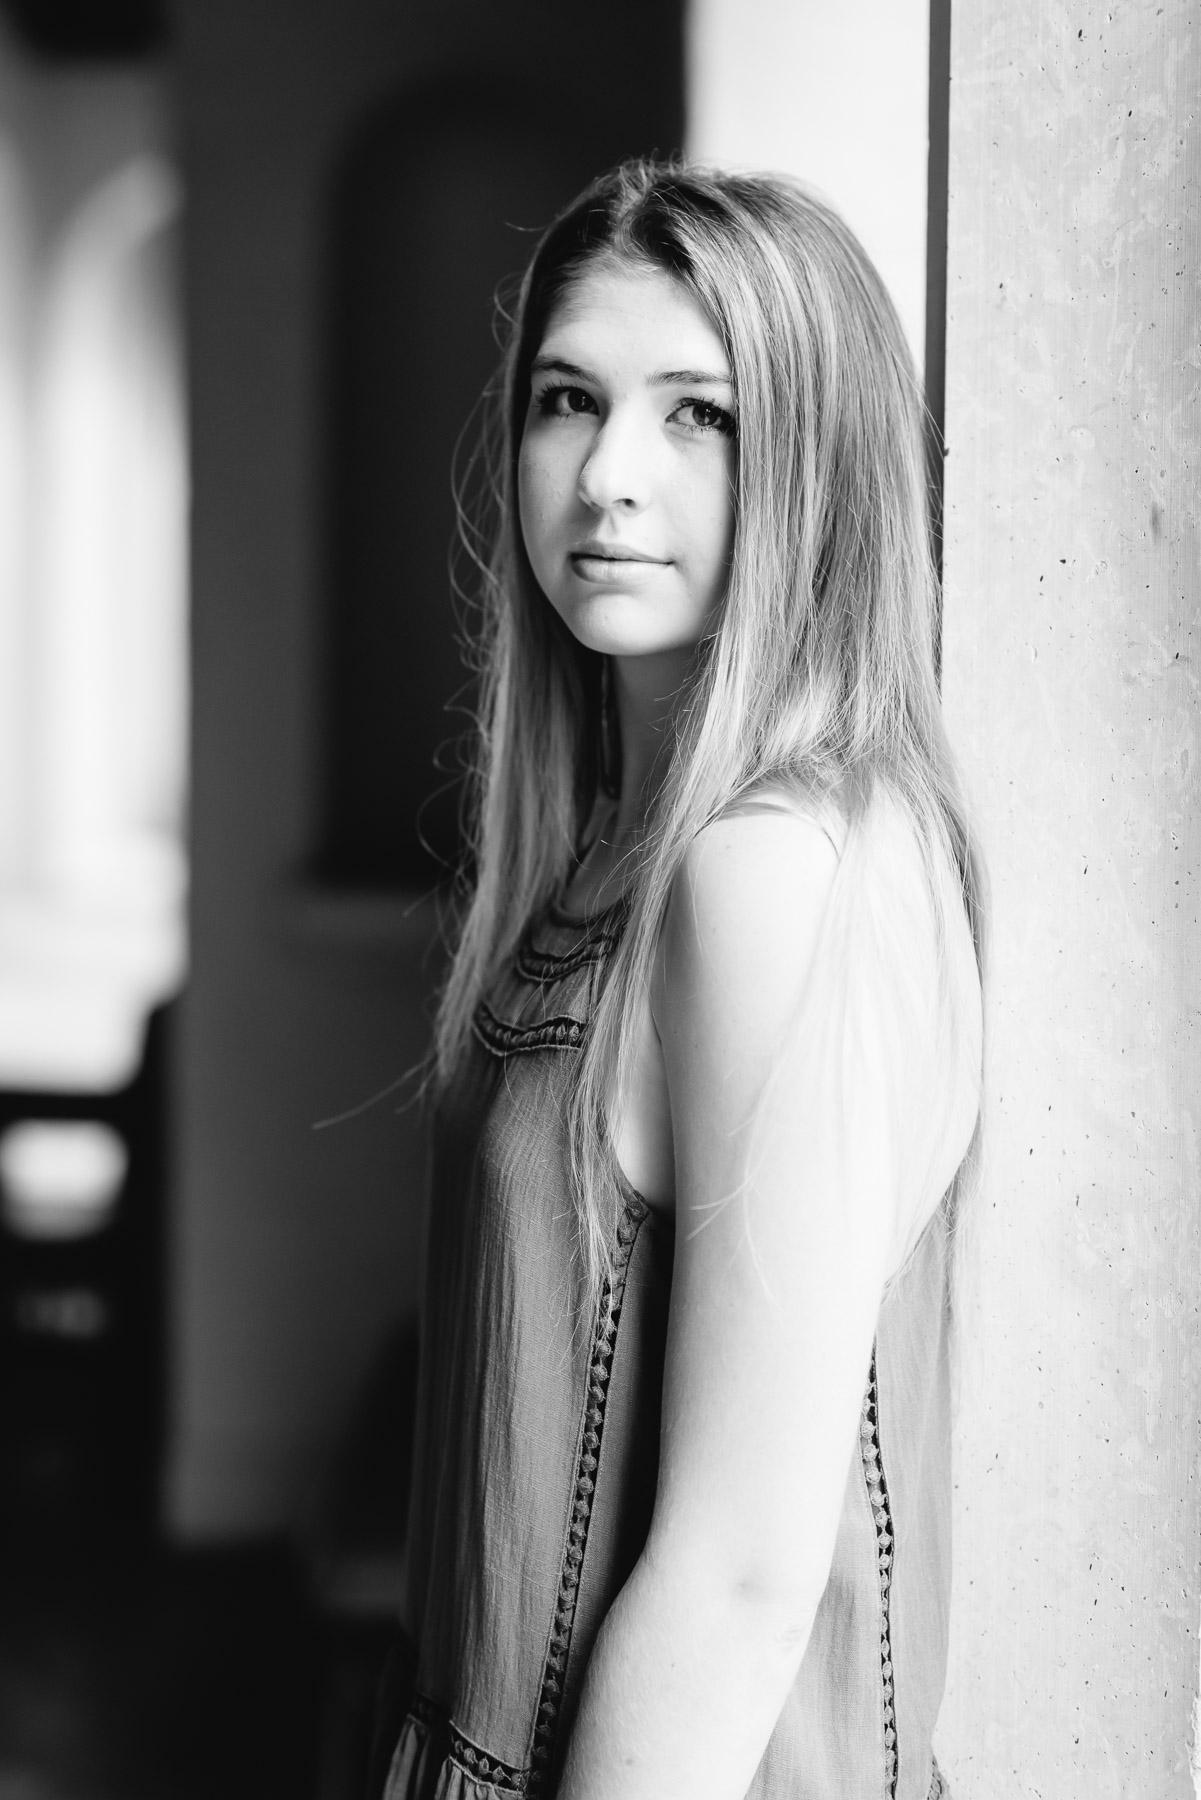 KateTaramykinStudios-Winter-Park-Senior-Portraits-Claire-12.jpg